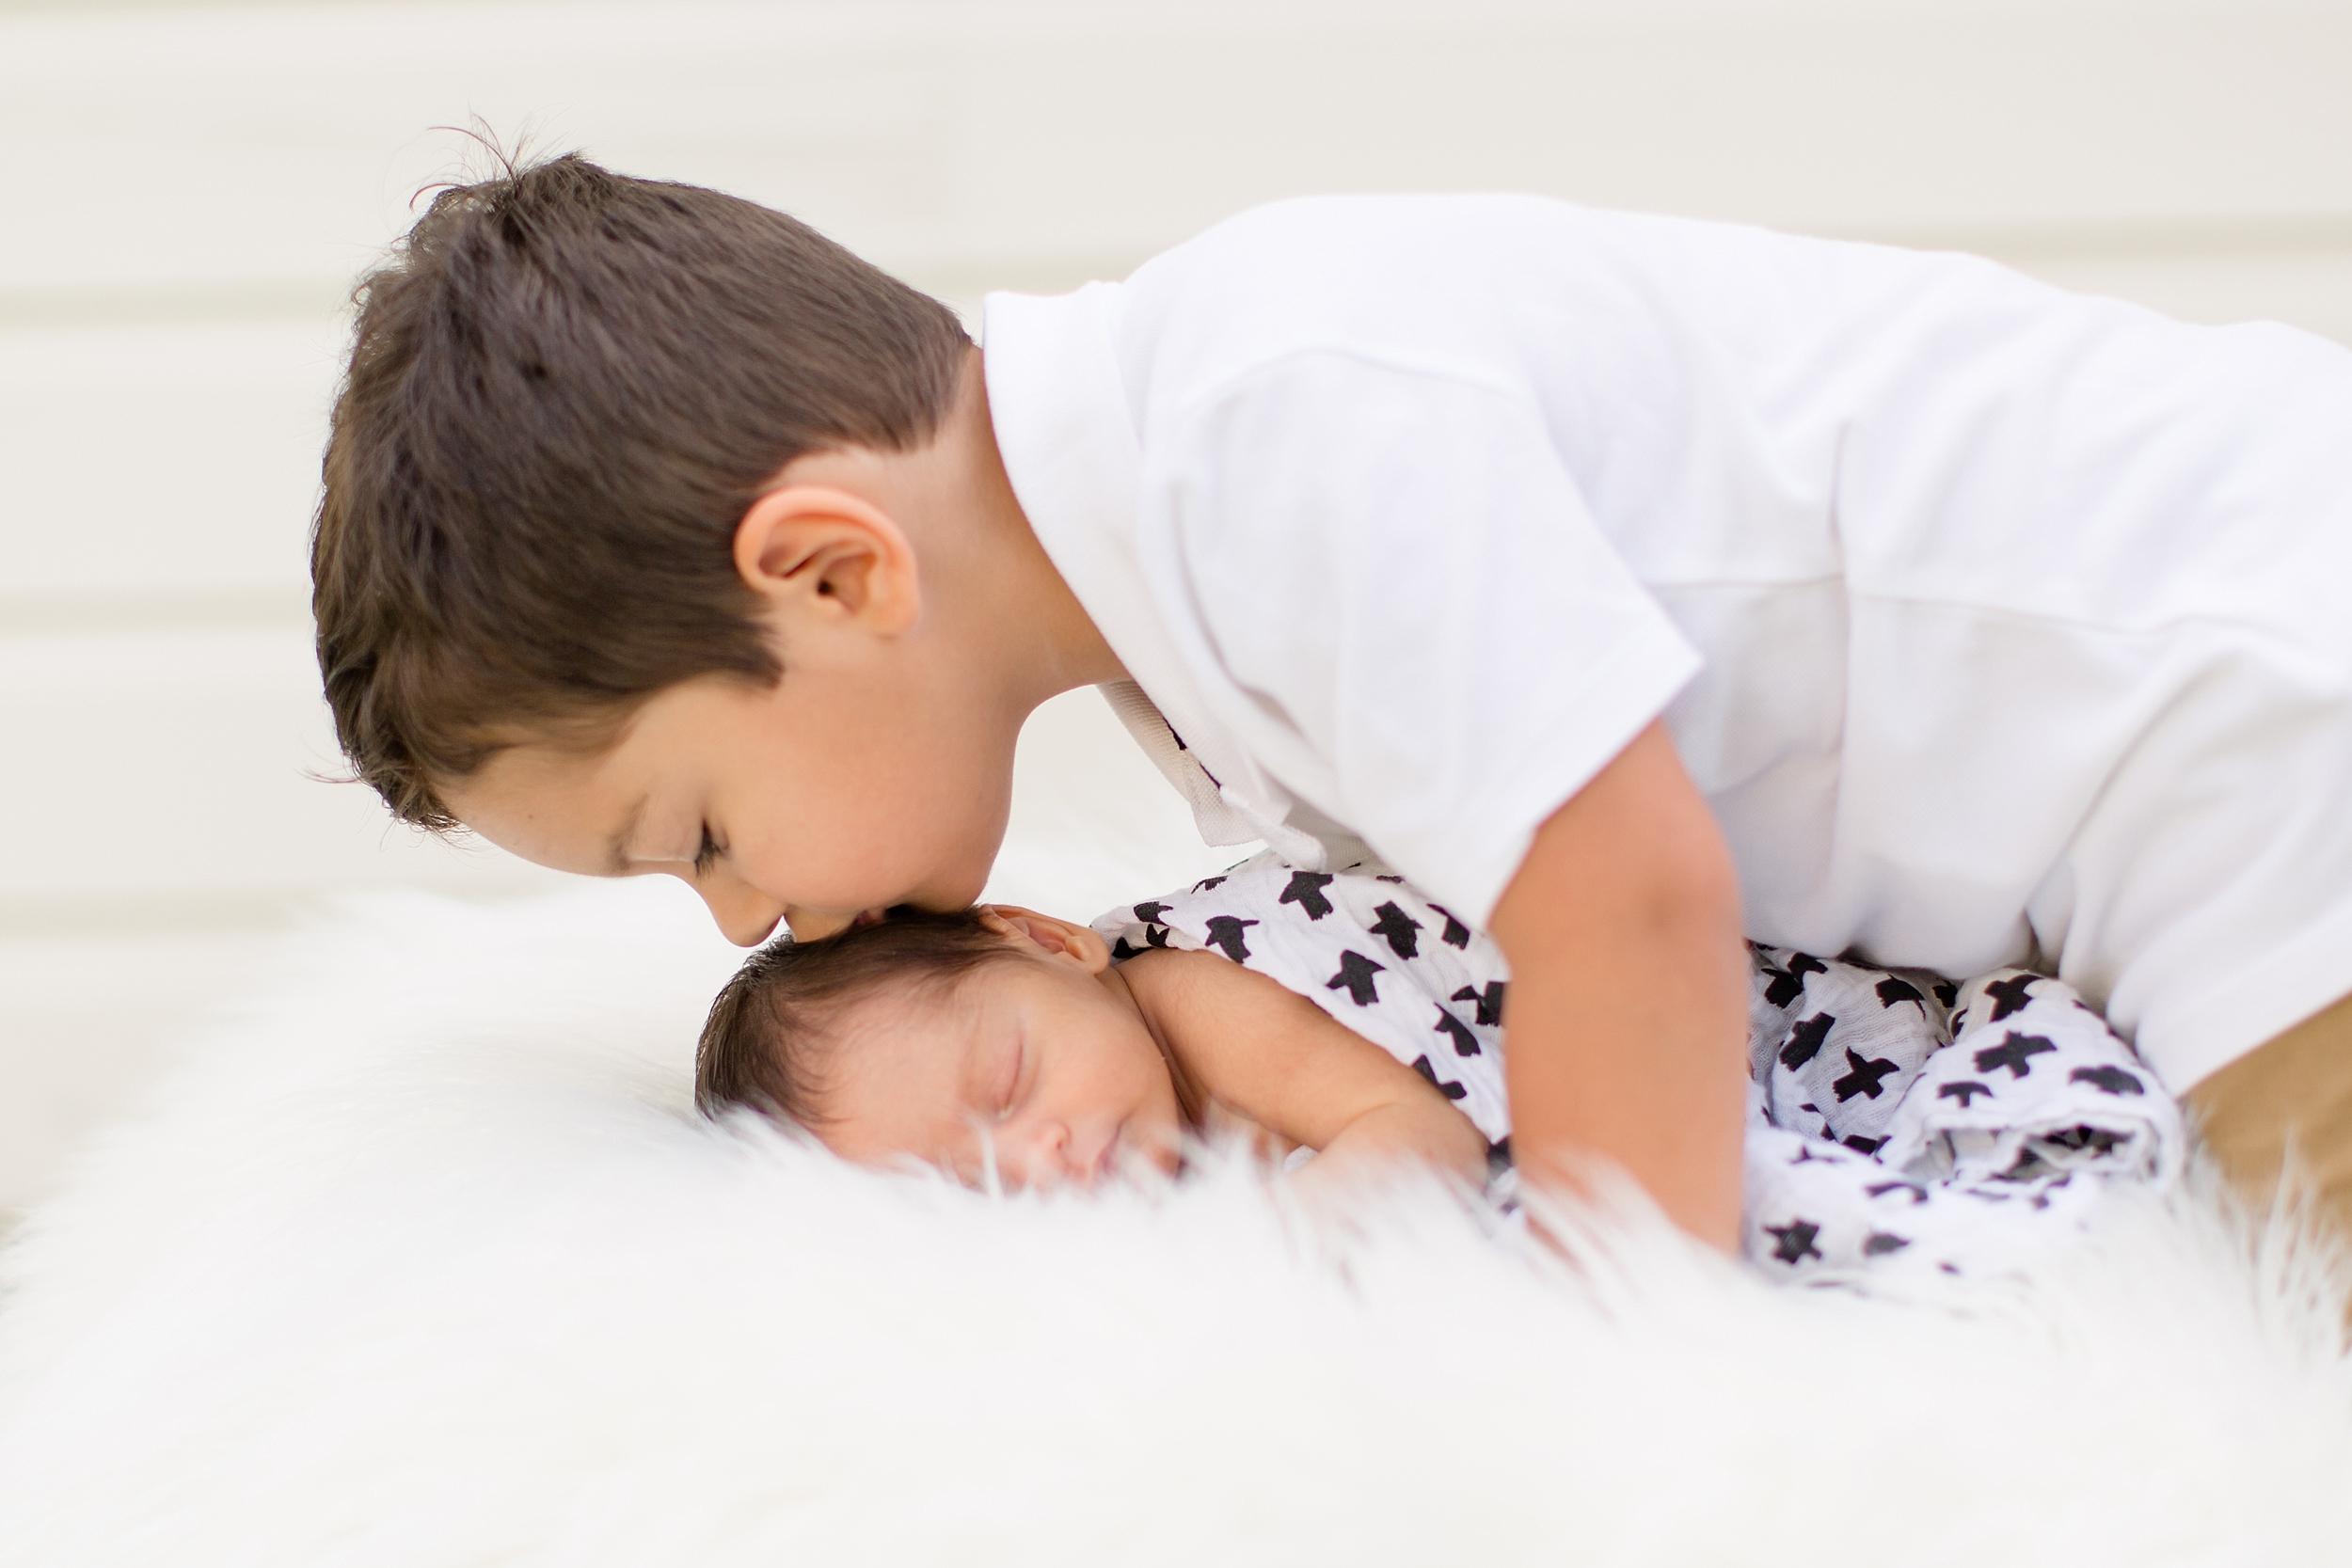 Landon-Schneider-Photography-Newborn-Session-Texas_0072.jpg